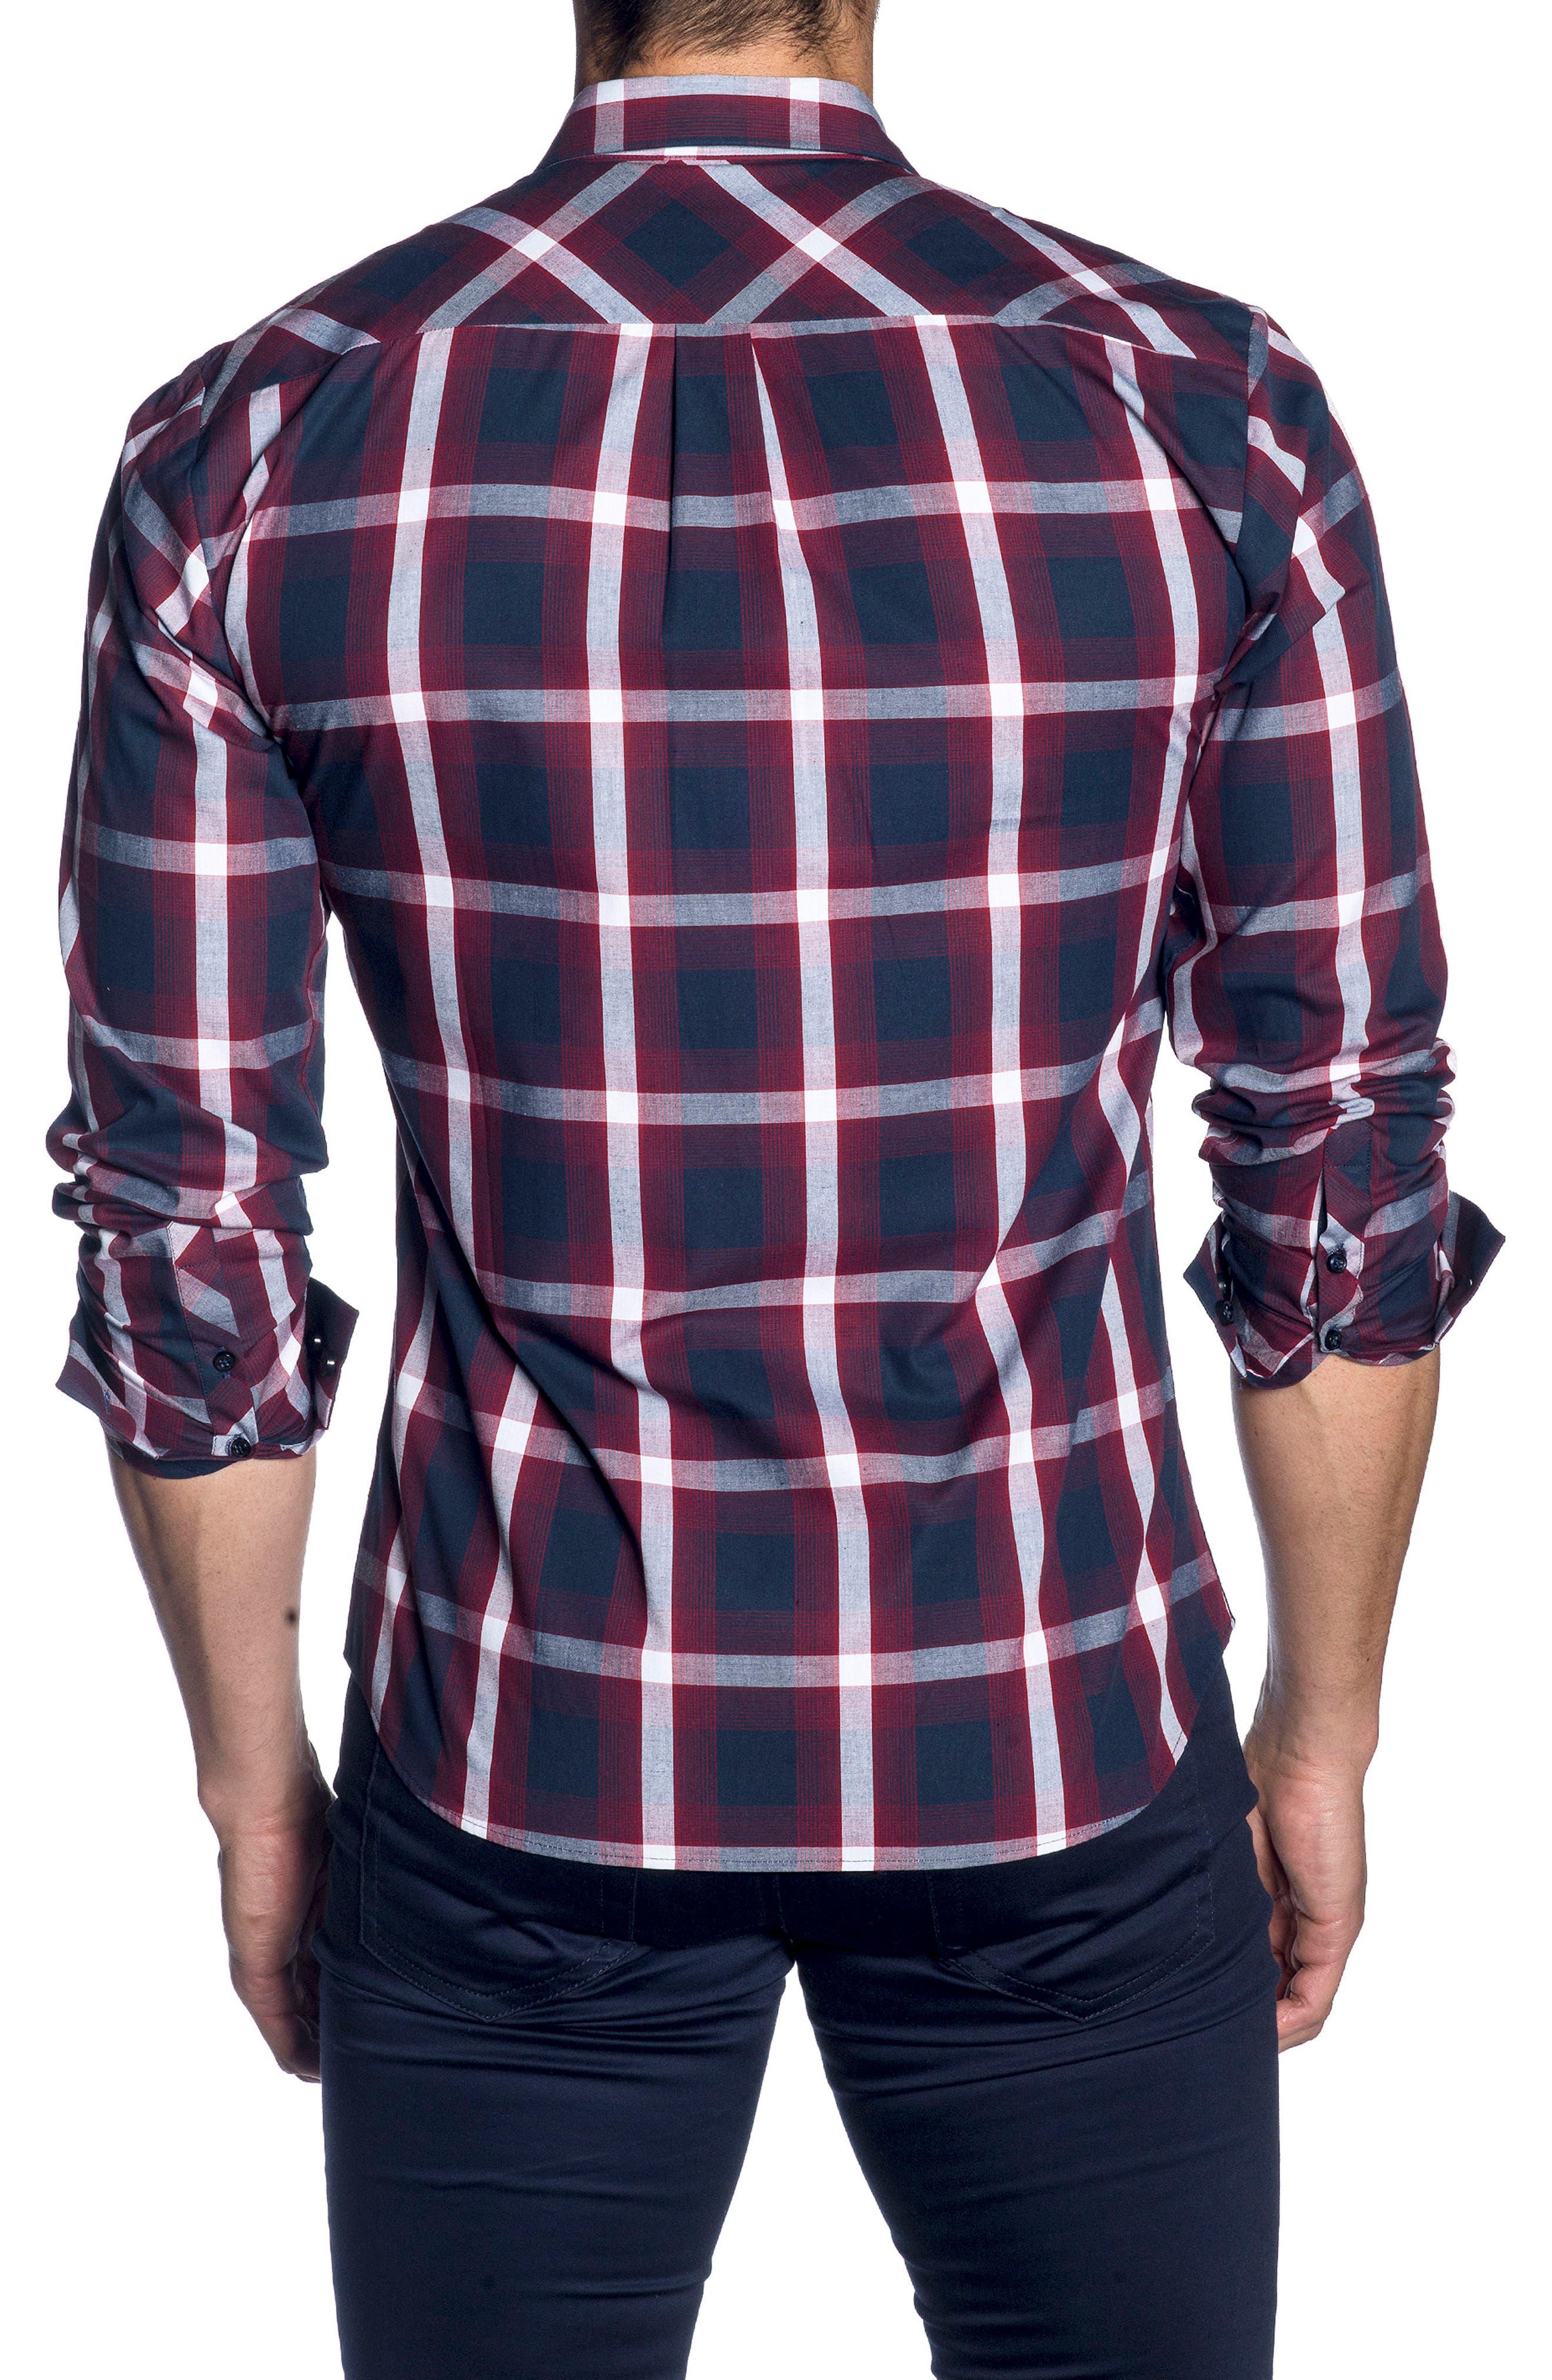 Trim Fit Sport Shirt,                             Alternate thumbnail 2, color,                             Navy Burgundy Check